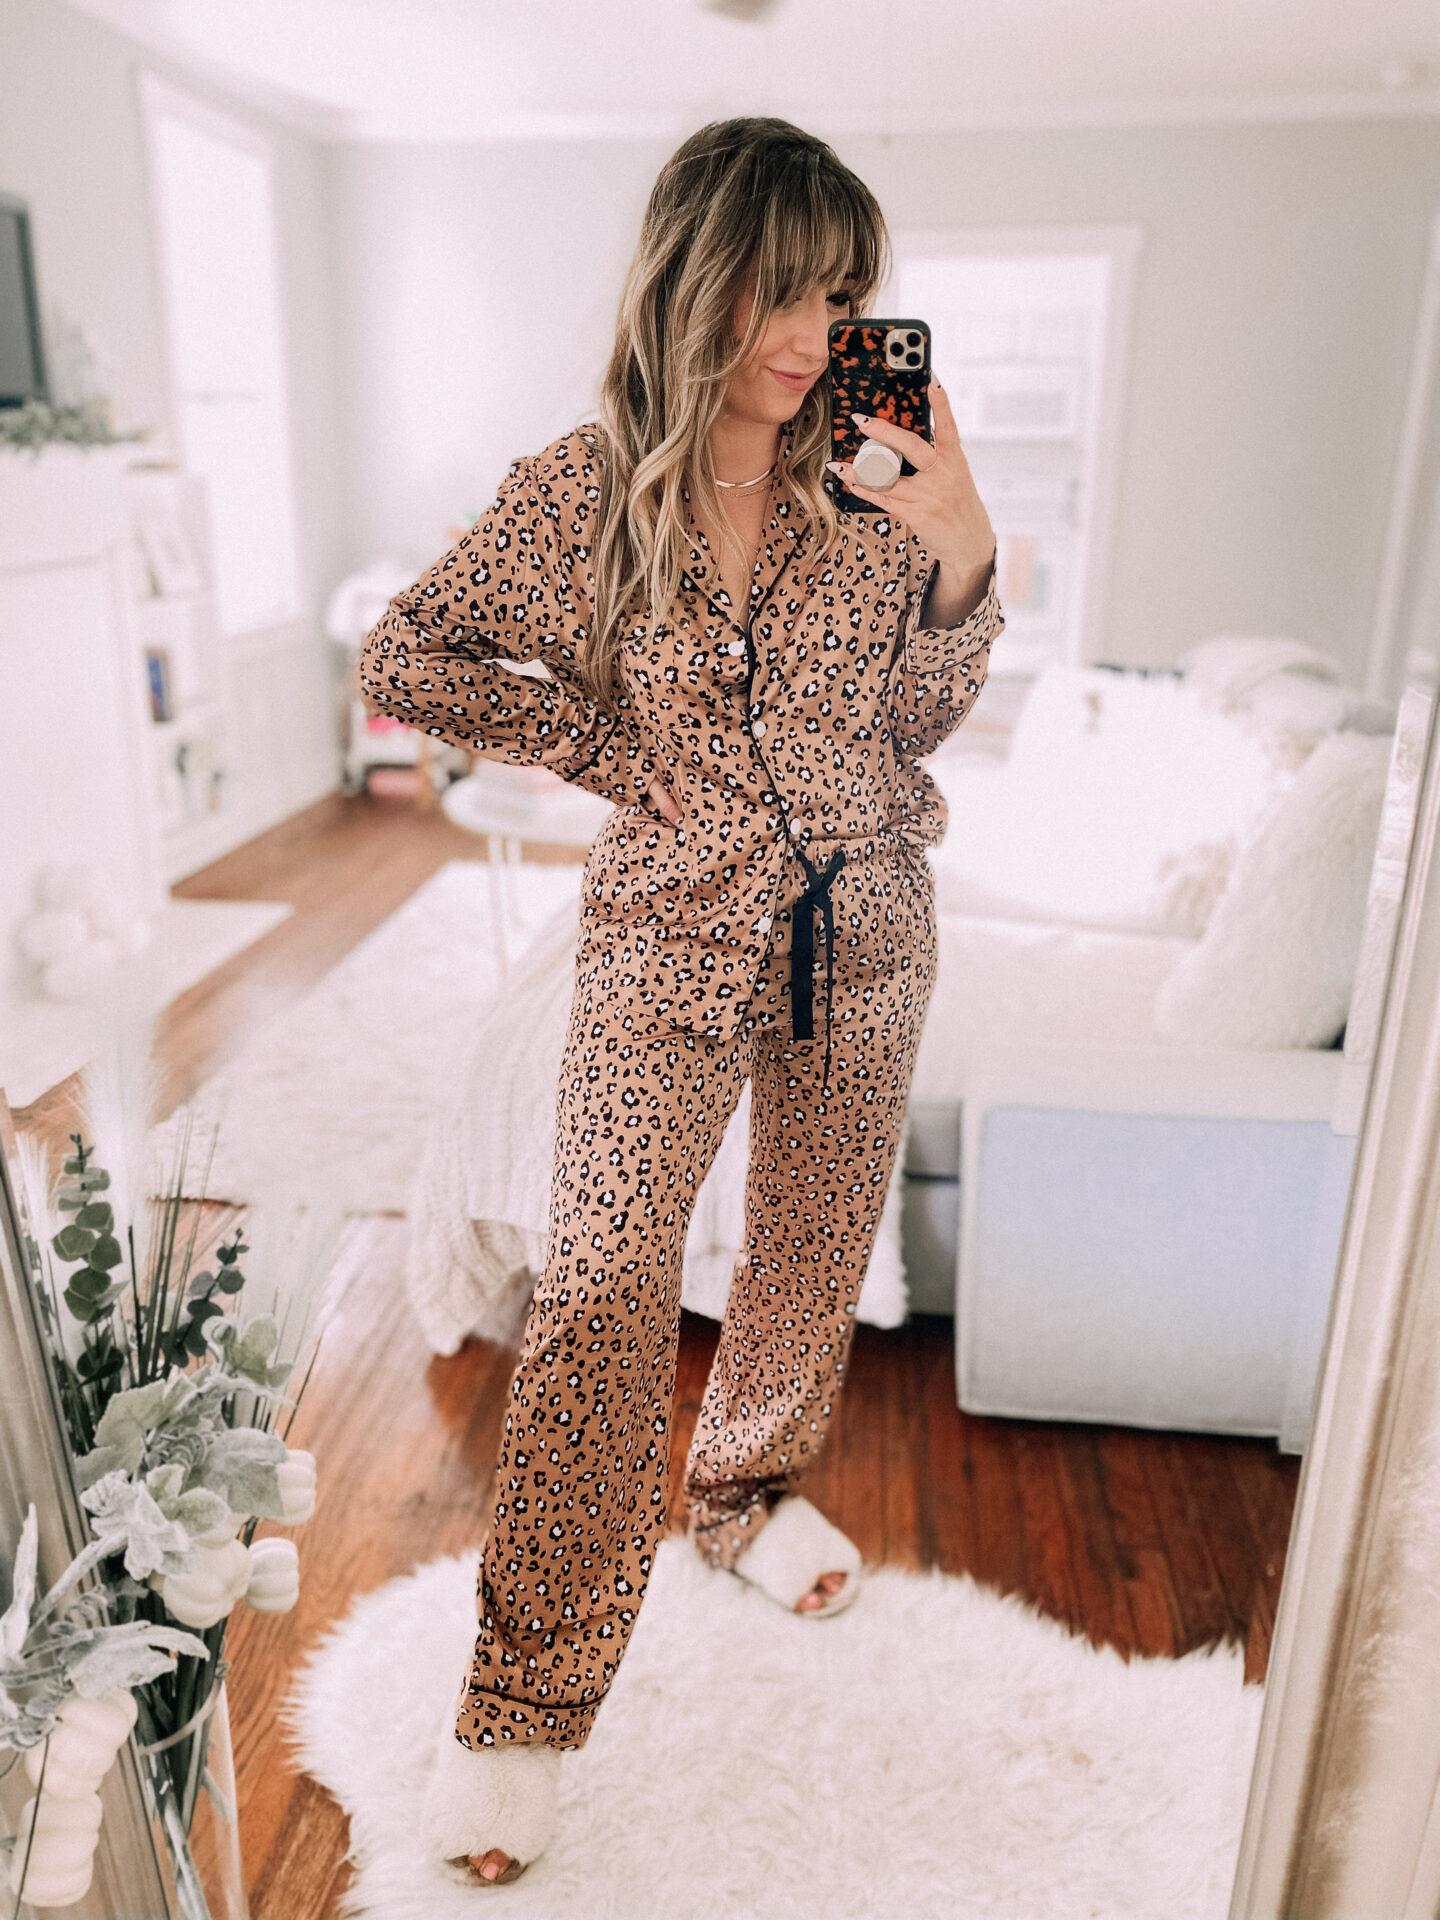 Leopard silk pajamas from Amazon